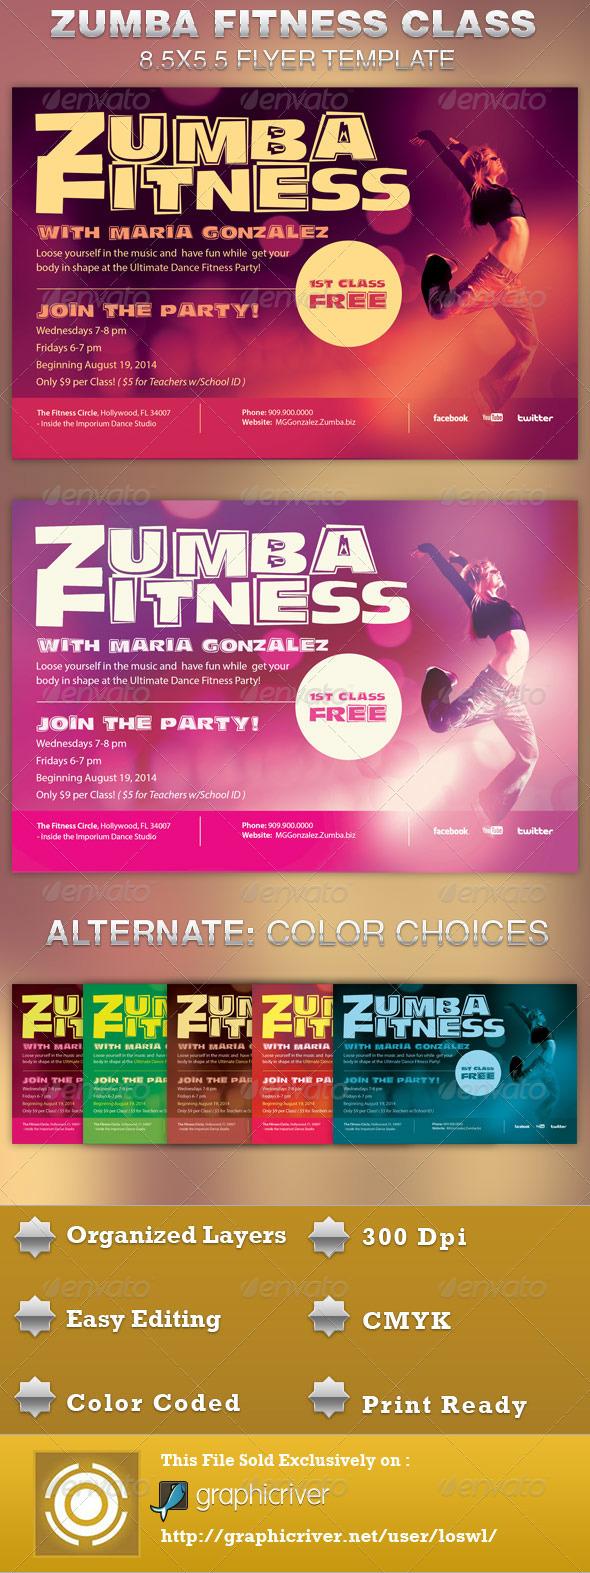 Zumba Fitness Flyer Zumba Fitness Class Flyer